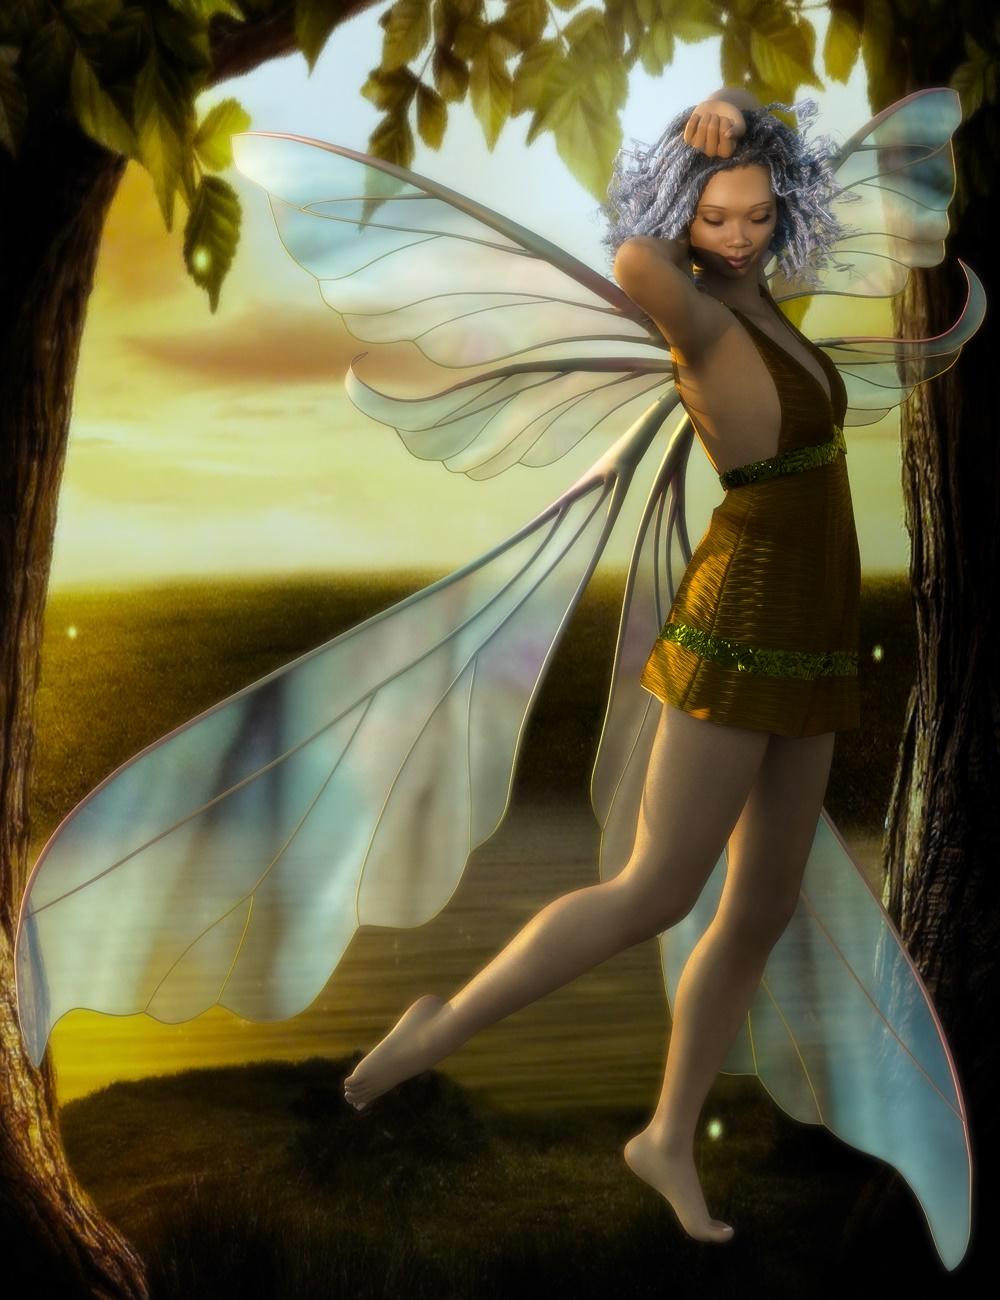 Contour Wings Lore for Genesis to Genesis 8.1 by: mirjagirl, 3D Models by Daz 3D